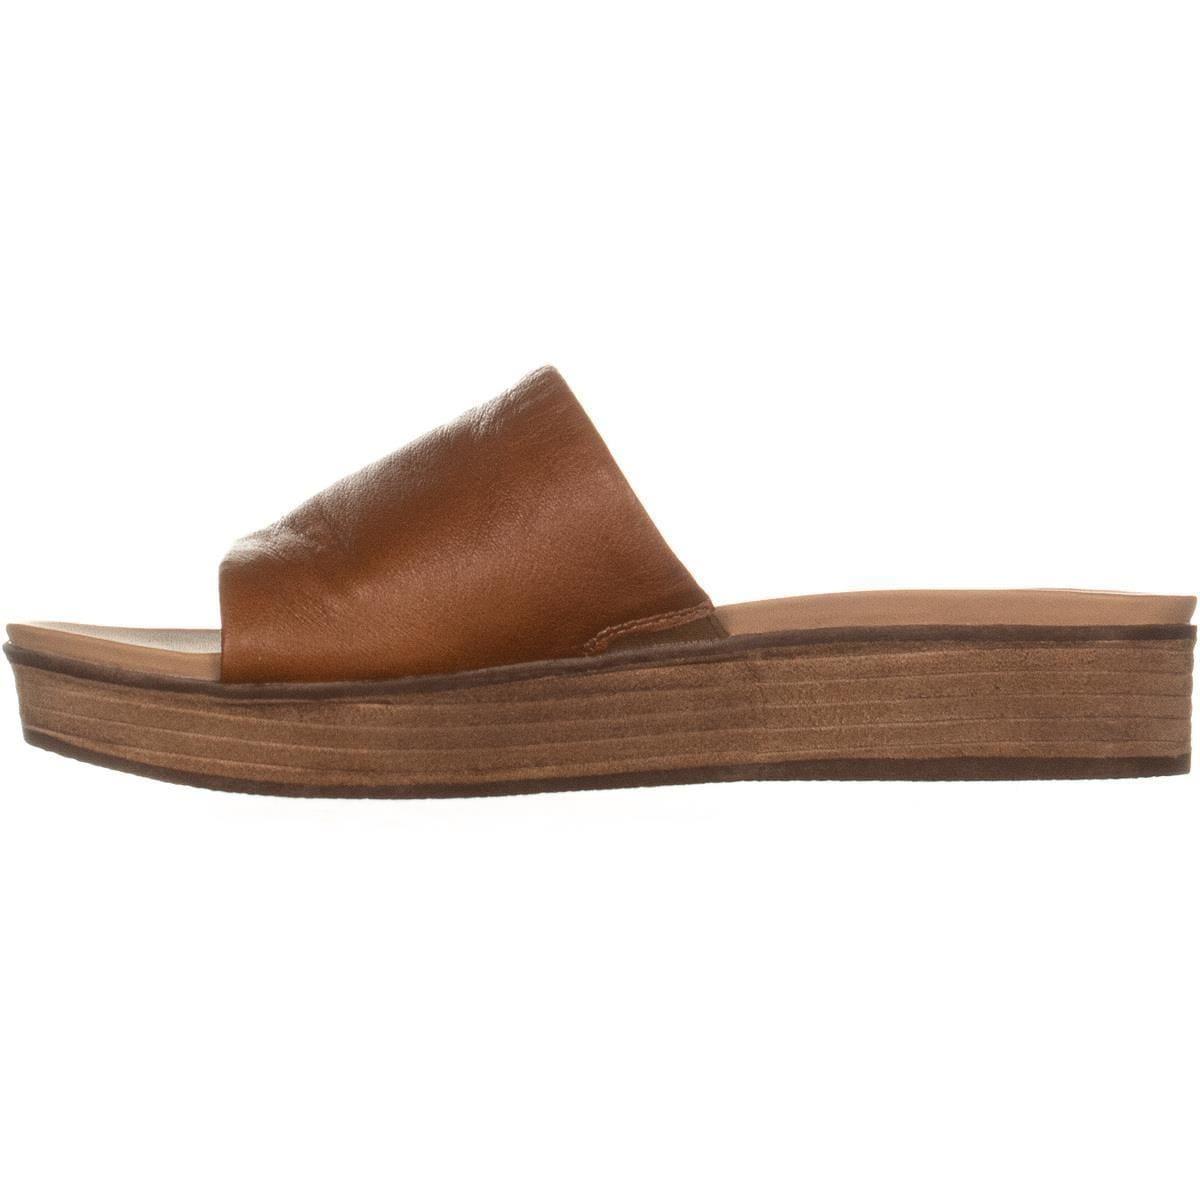 7f2baa43a4 Shop Steve Madden Genca Platform Slide Sandals, Tan Leather - 8.5 US - On  Sale - Free Shipping On Orders Over $45 - Overstock - 25624785